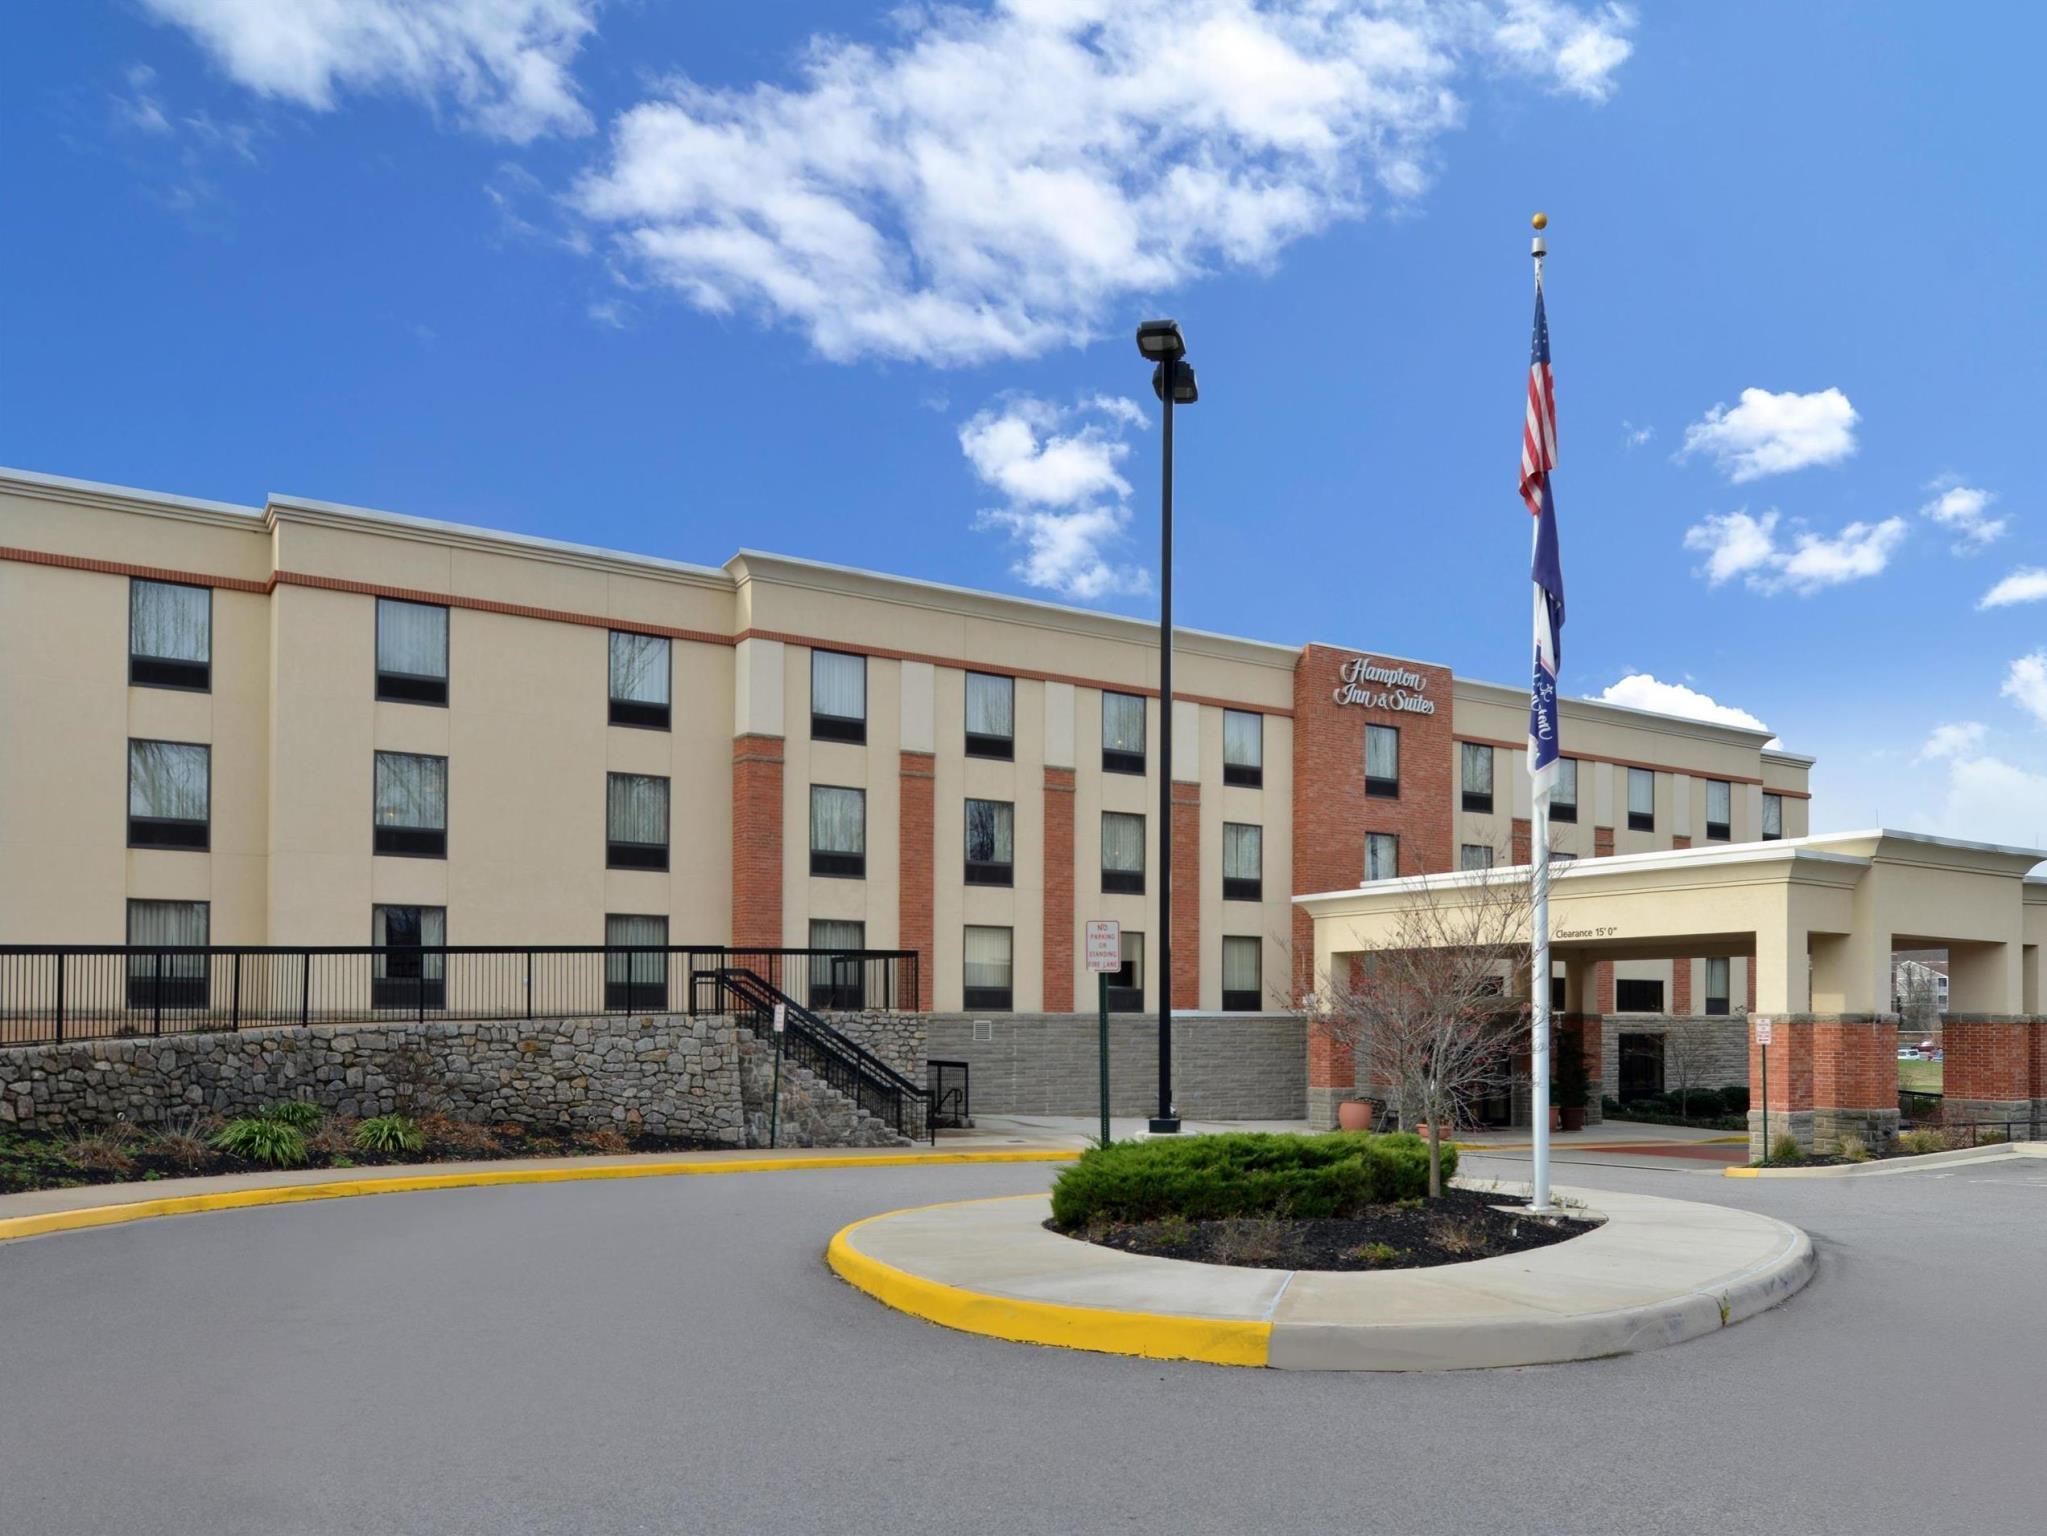 Hampton Inn And Suites Mt. Vernon Belvoir Alexandria South Area